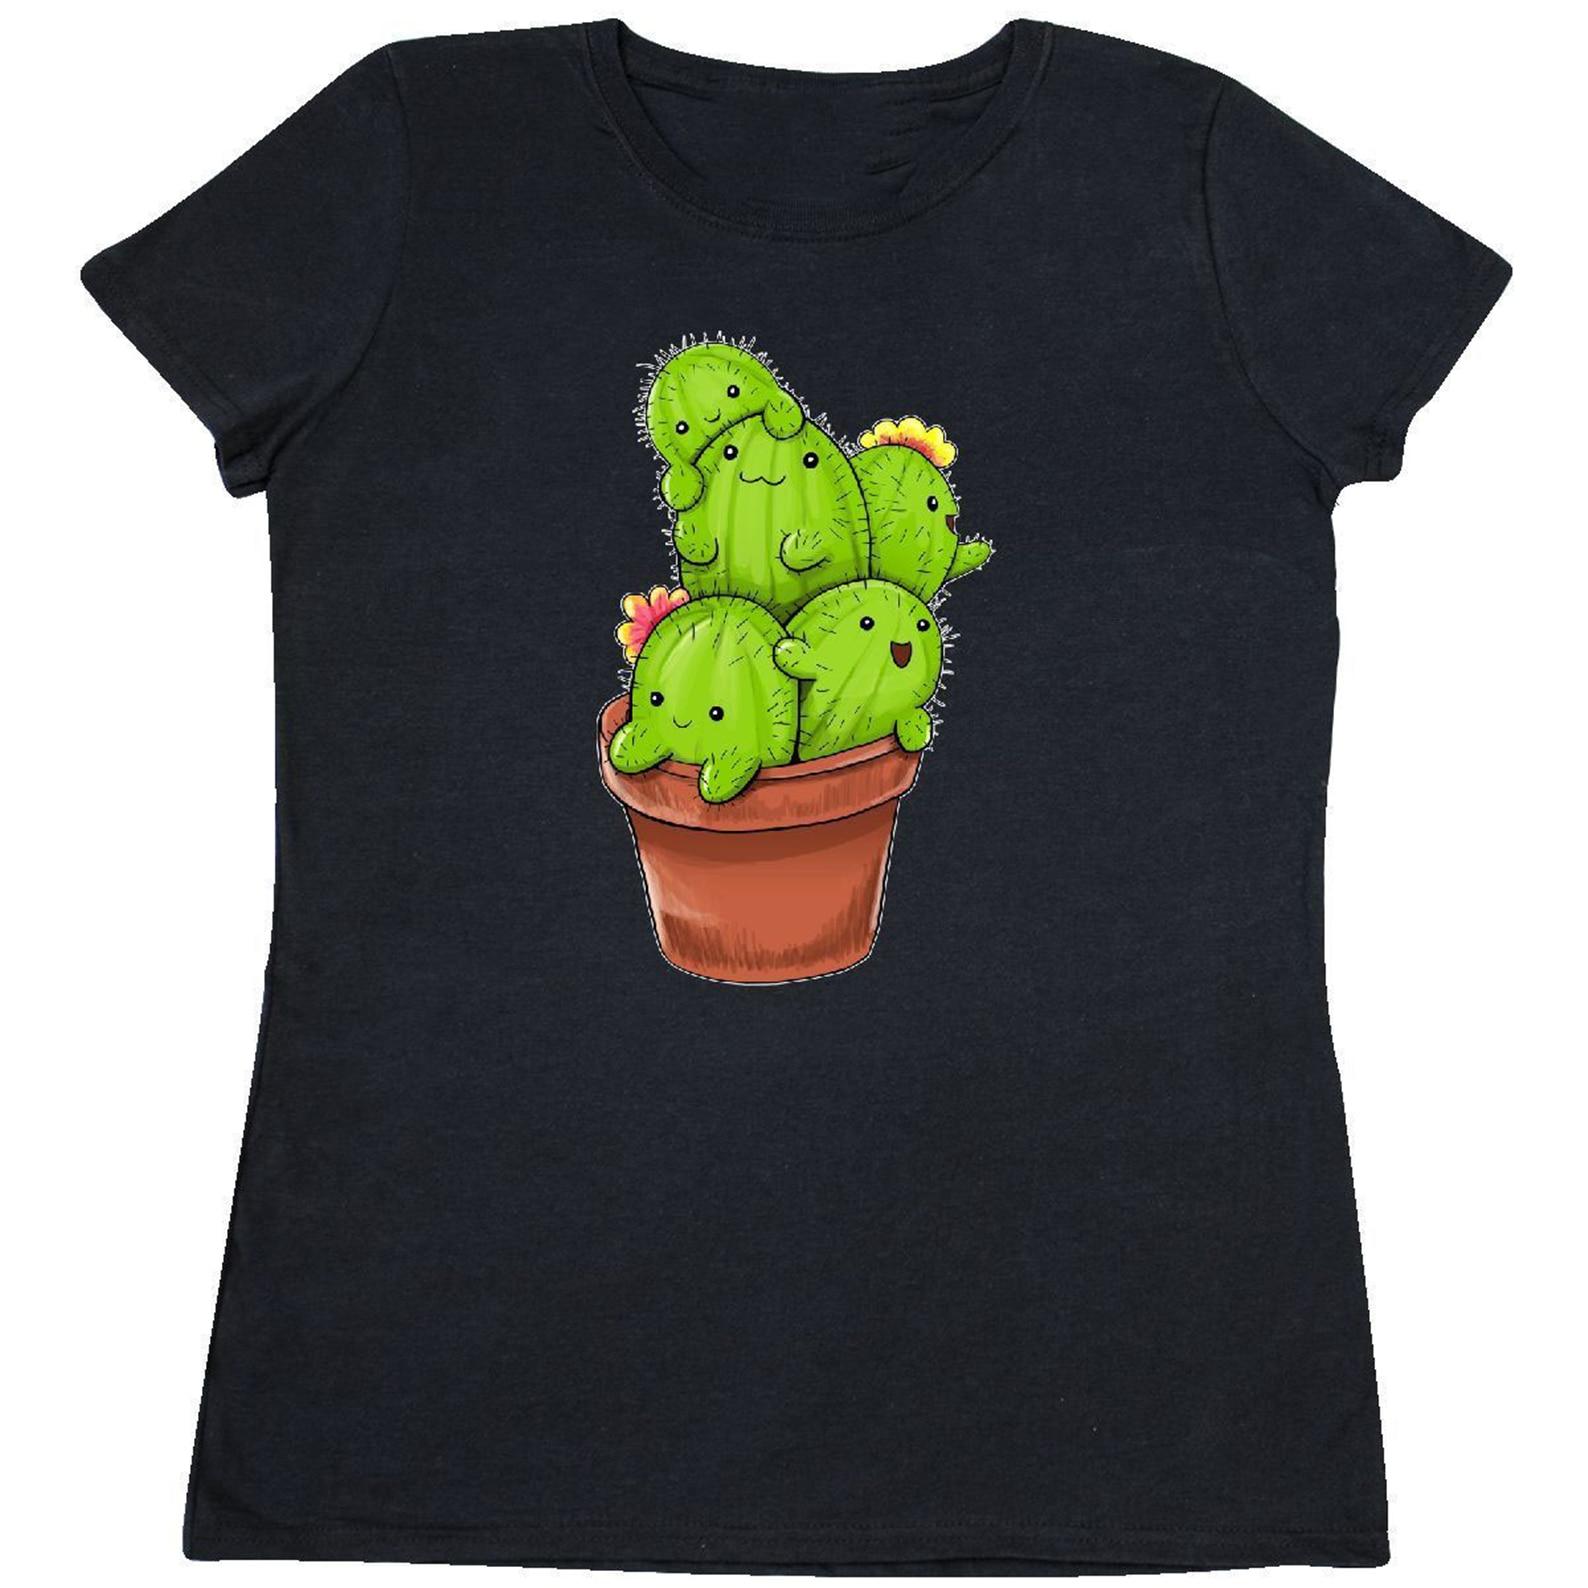 inktastic Cactus Kindness Baby T-Shirt